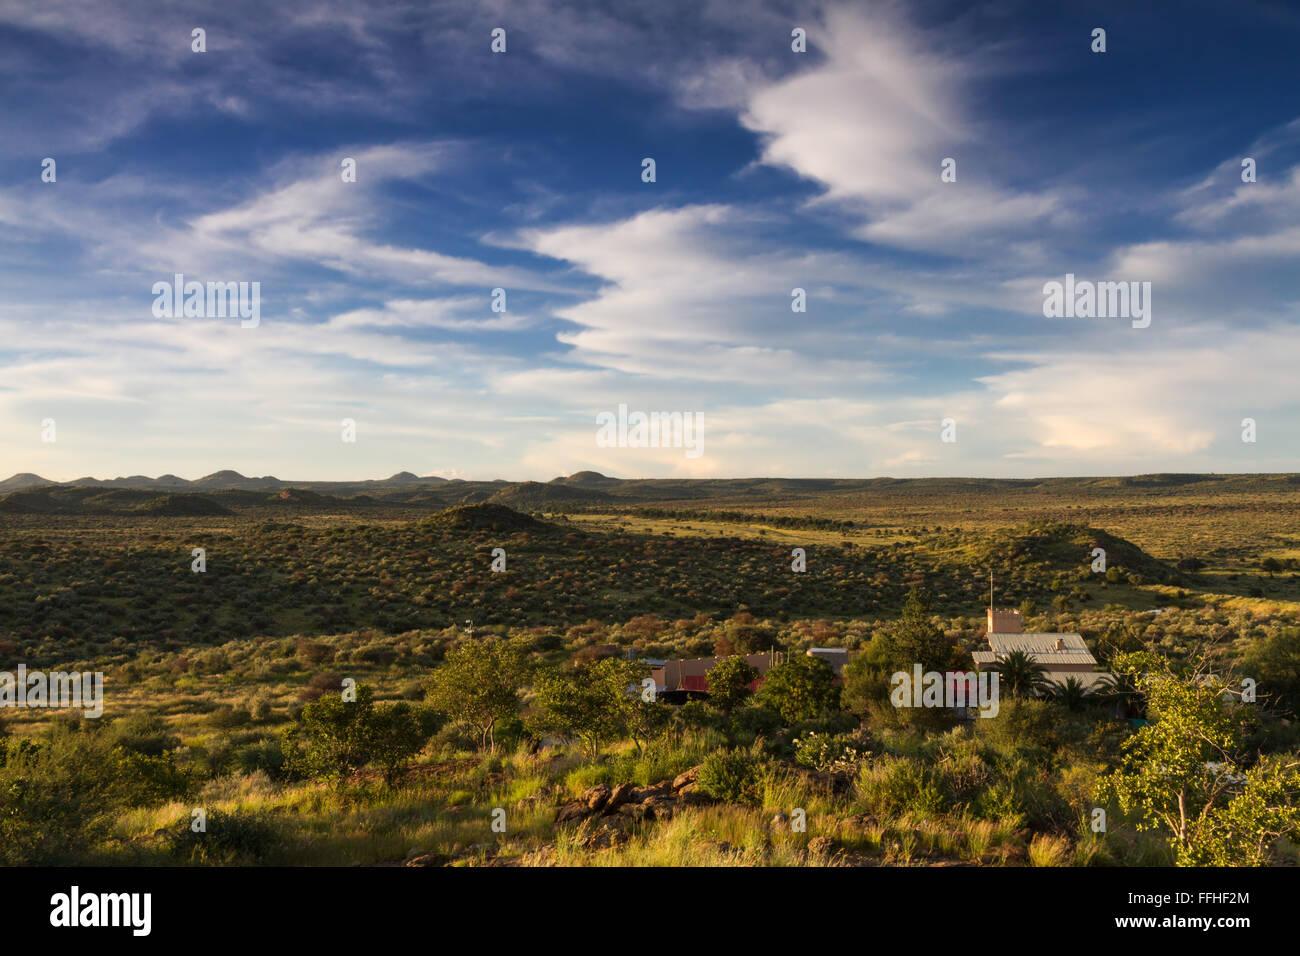 Grassland of Namibia in the rain season near Windhoek - Stock Image